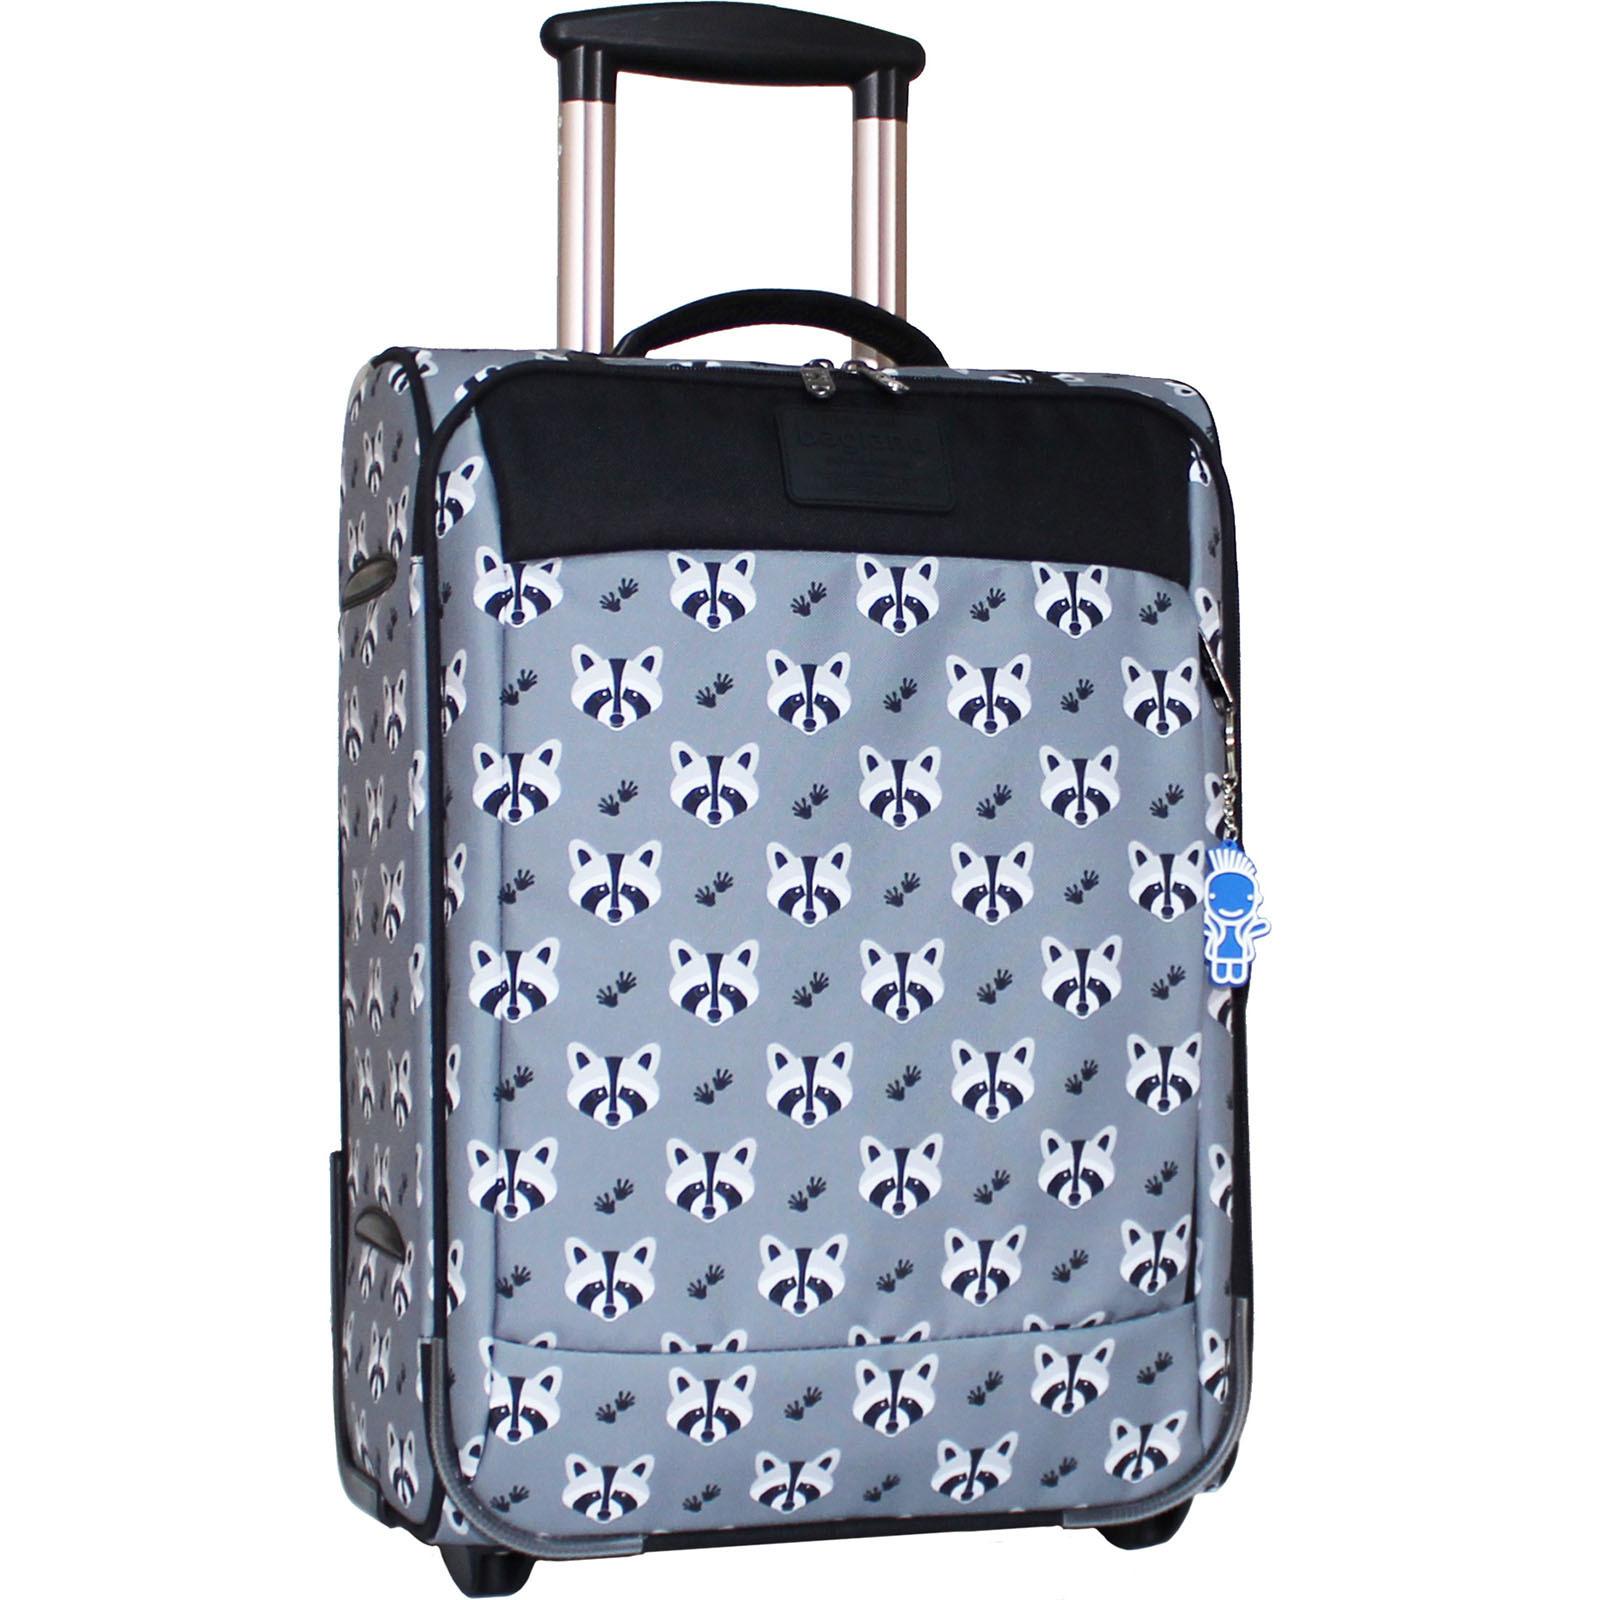 Дорожные чемоданы Чемодан Bagland Vichenzo 32 л. сублімація 353 (0037666194) IMG_7843_аот_353_.JPG